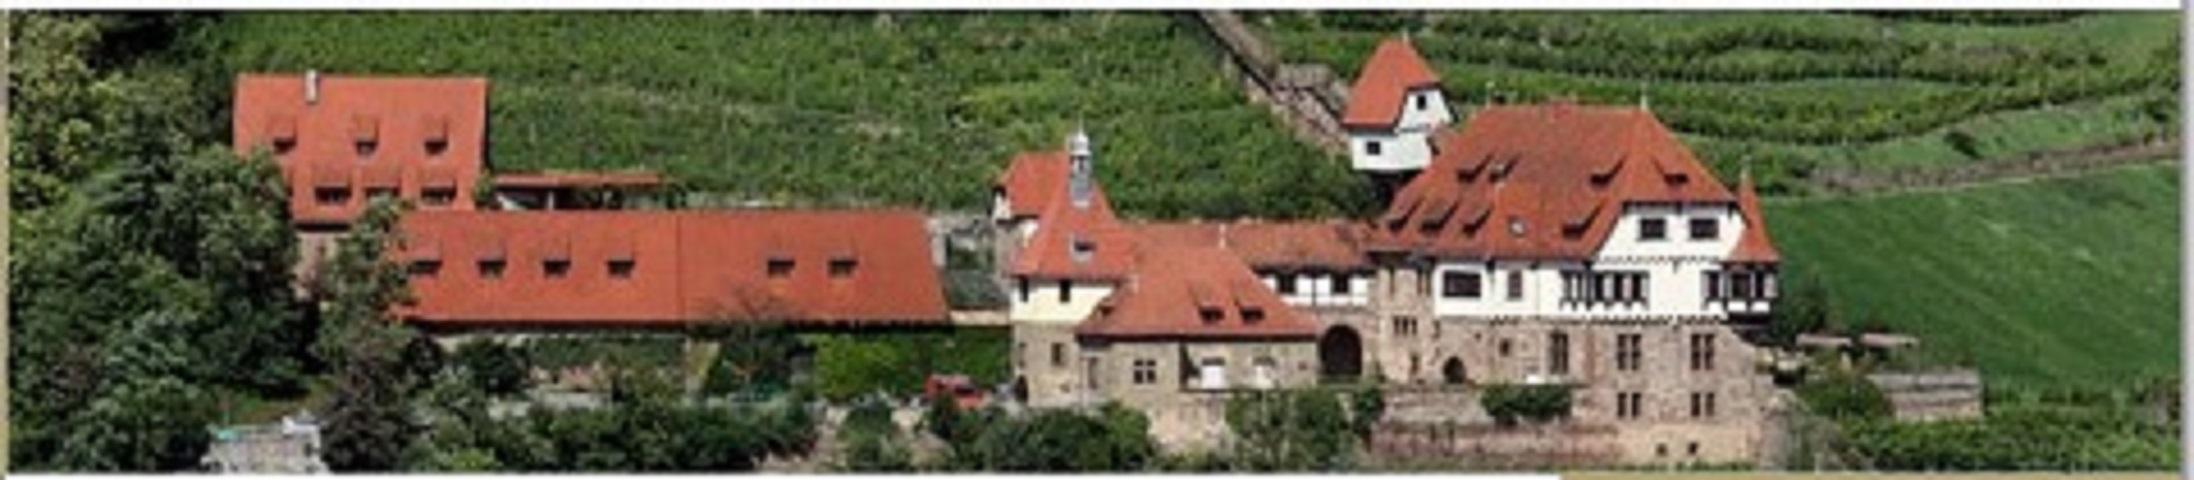 Schloss Beilstein